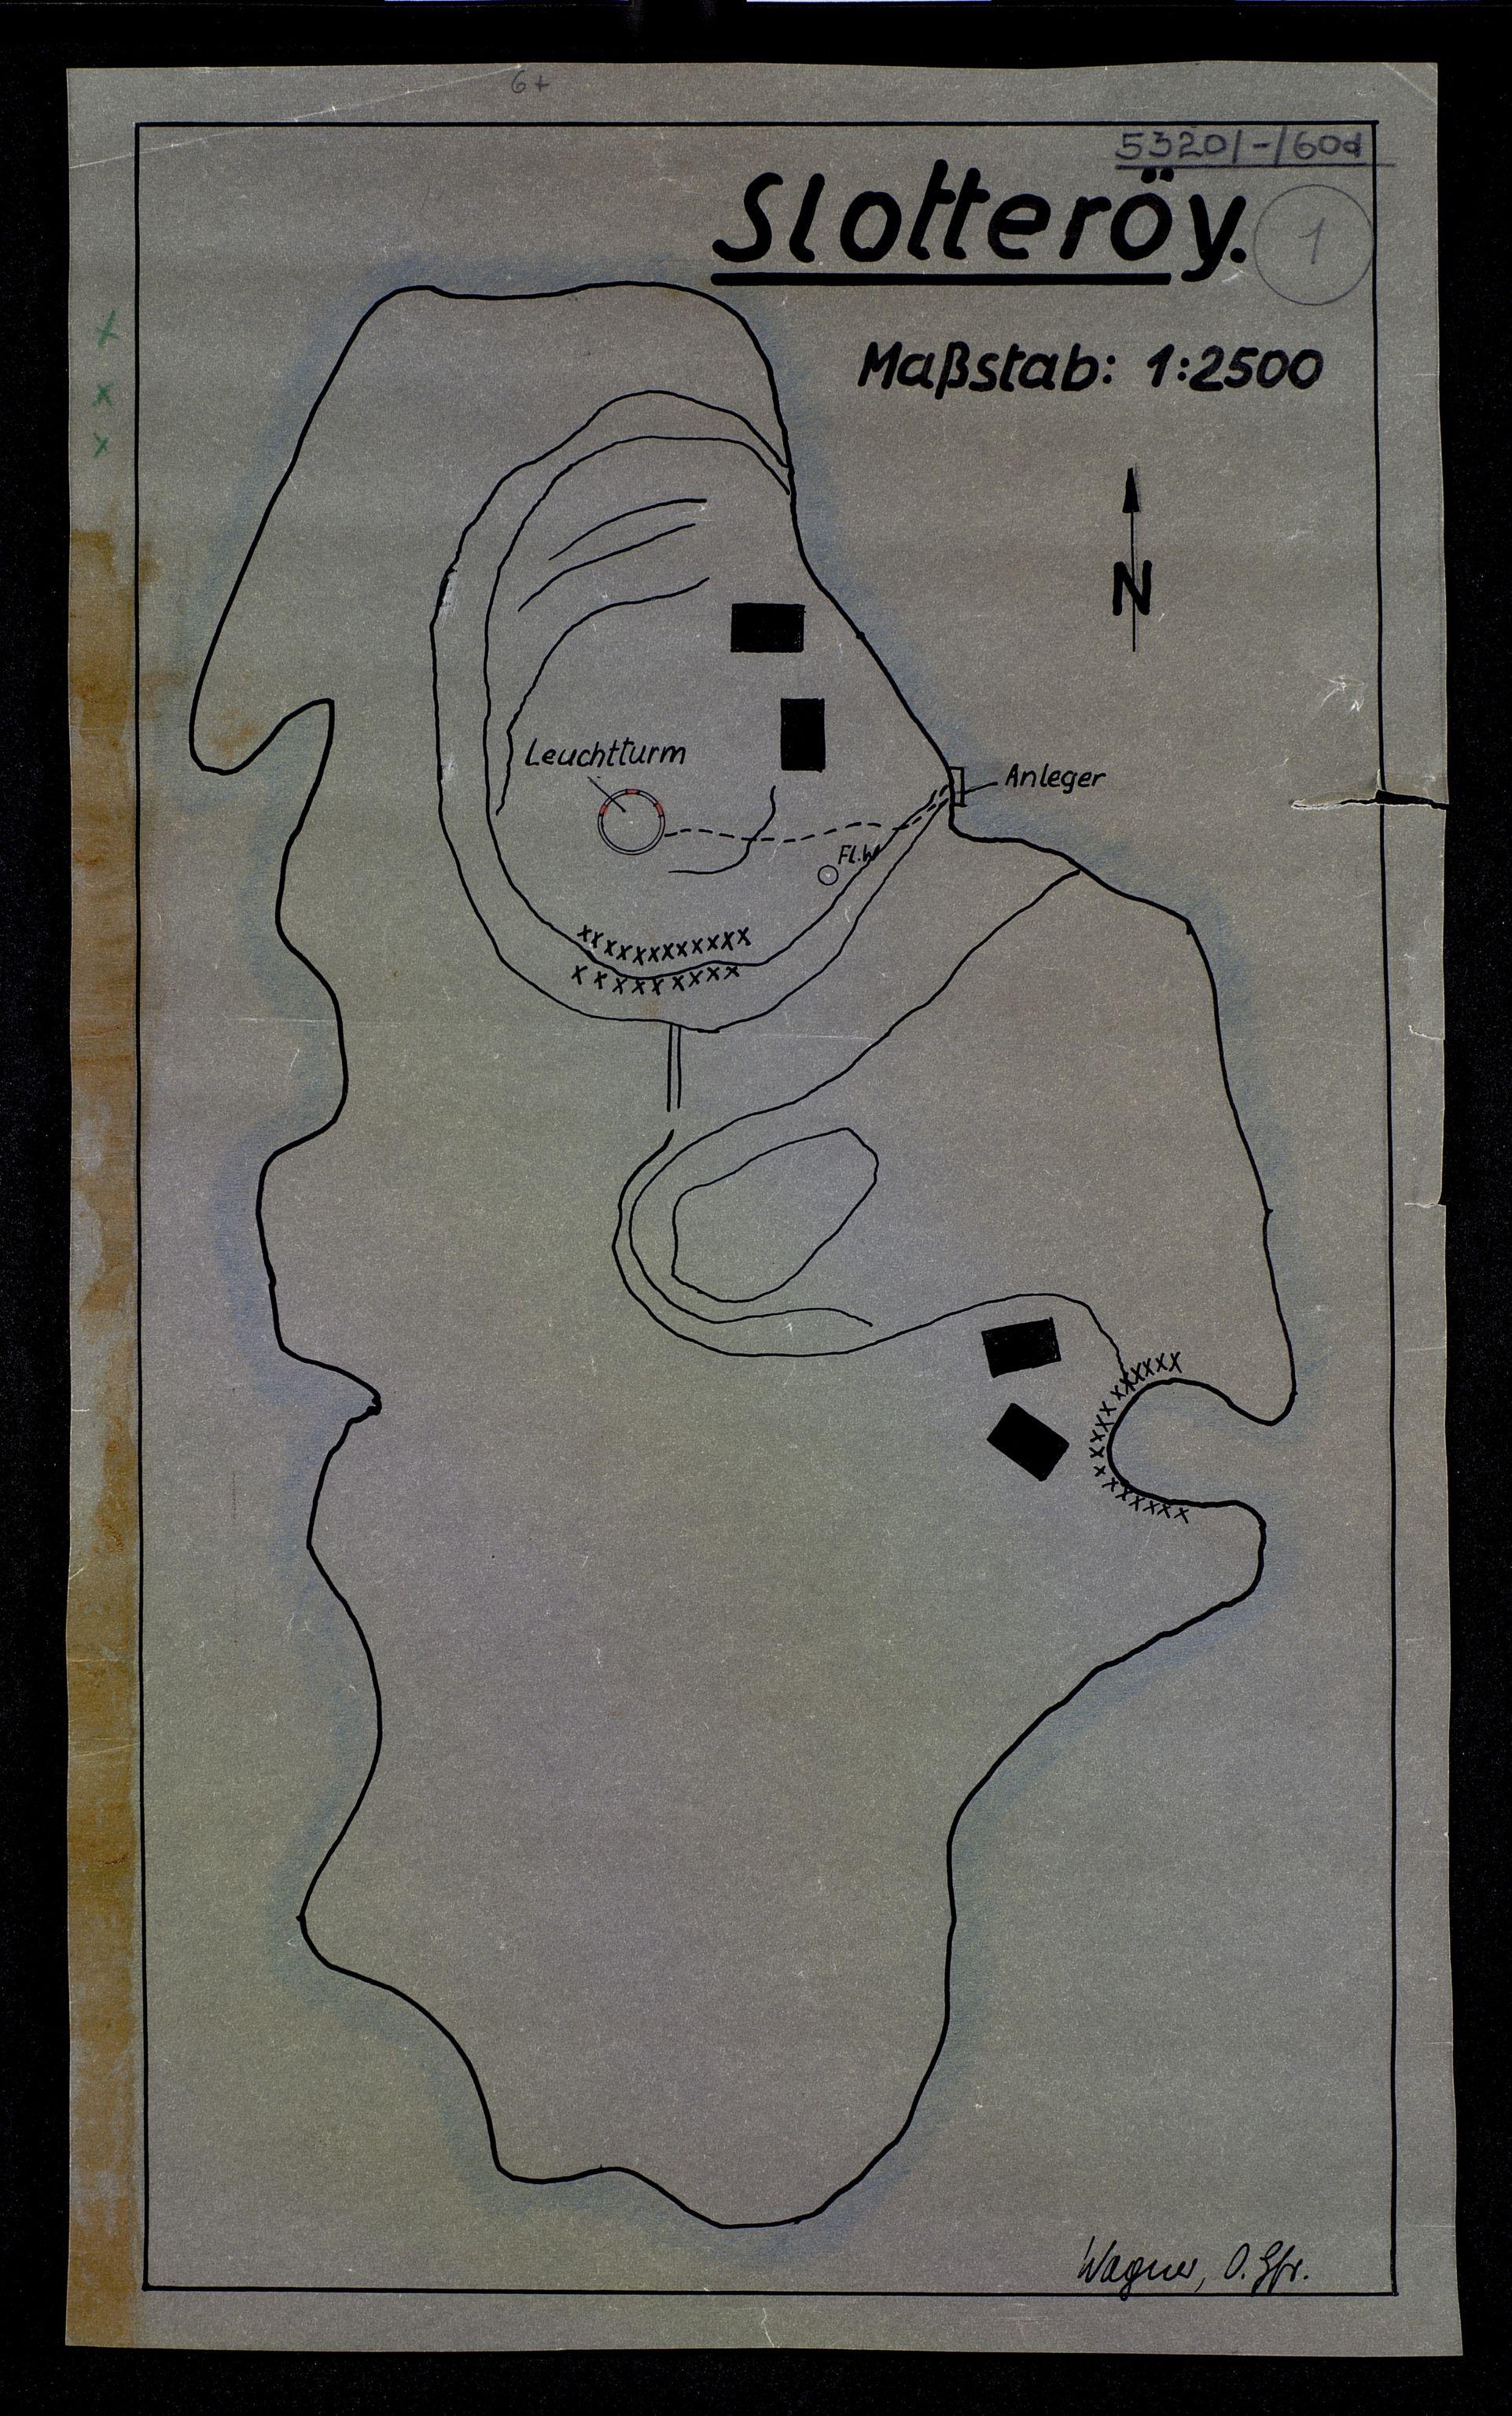 SAB, Ukjent arkiv (SAB), 1943-1945, s. 1